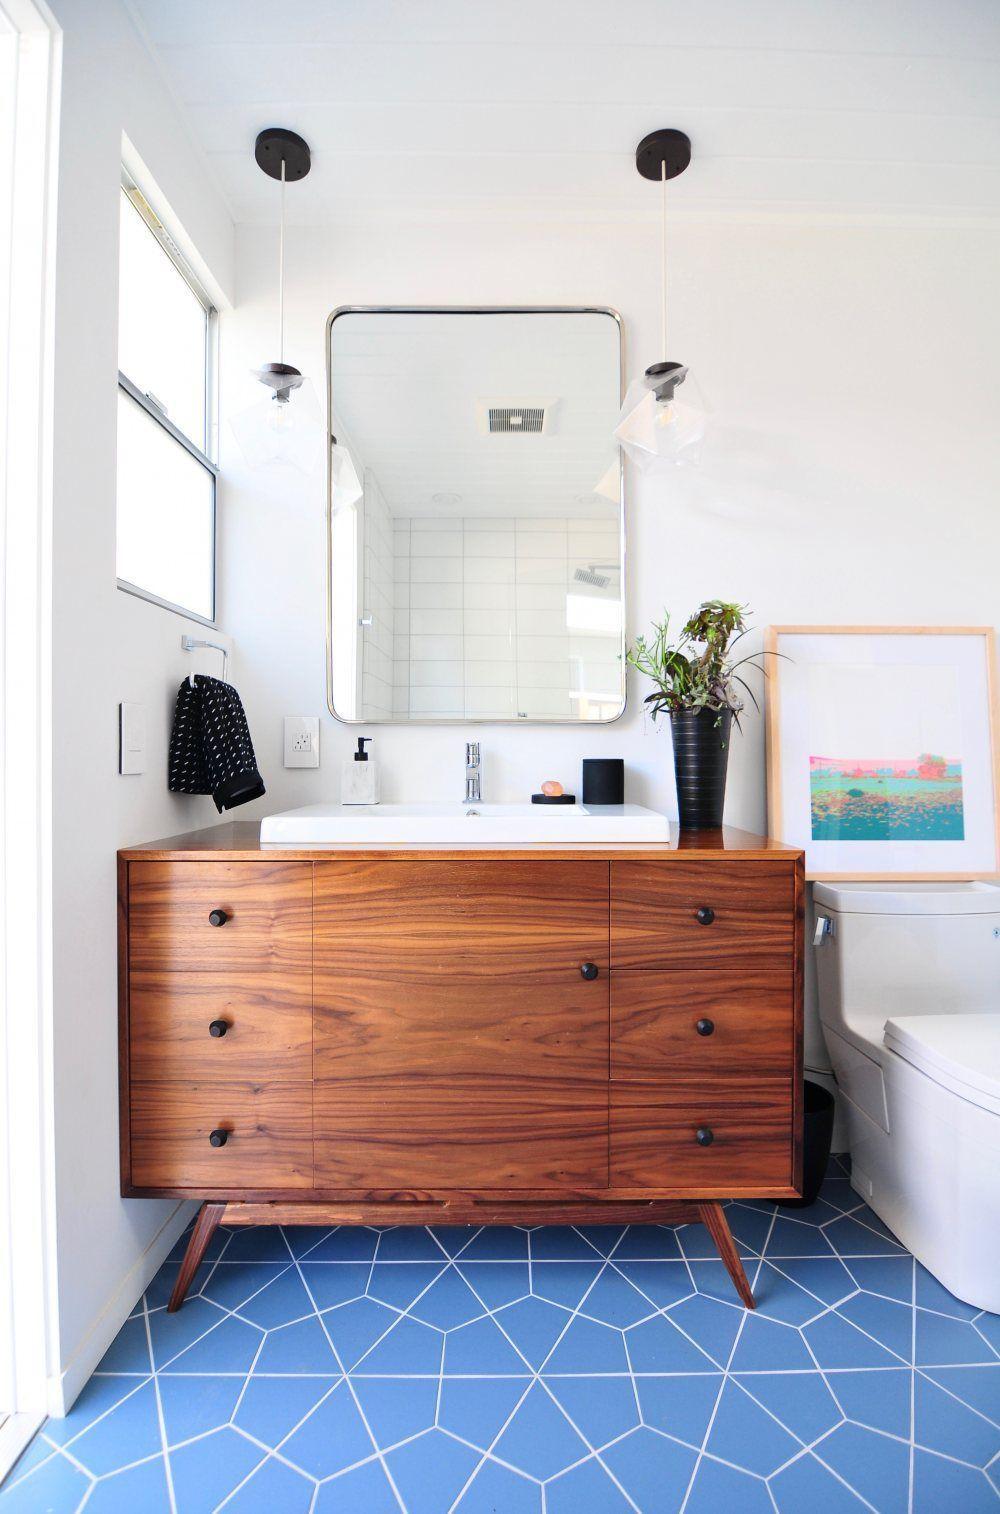 30 Awesome Mid Century Modern Bathroom Ideas You Should See This Year Modern Master Bathroom Midcentury Modern Bathroom Mid Century Modern Bathroom